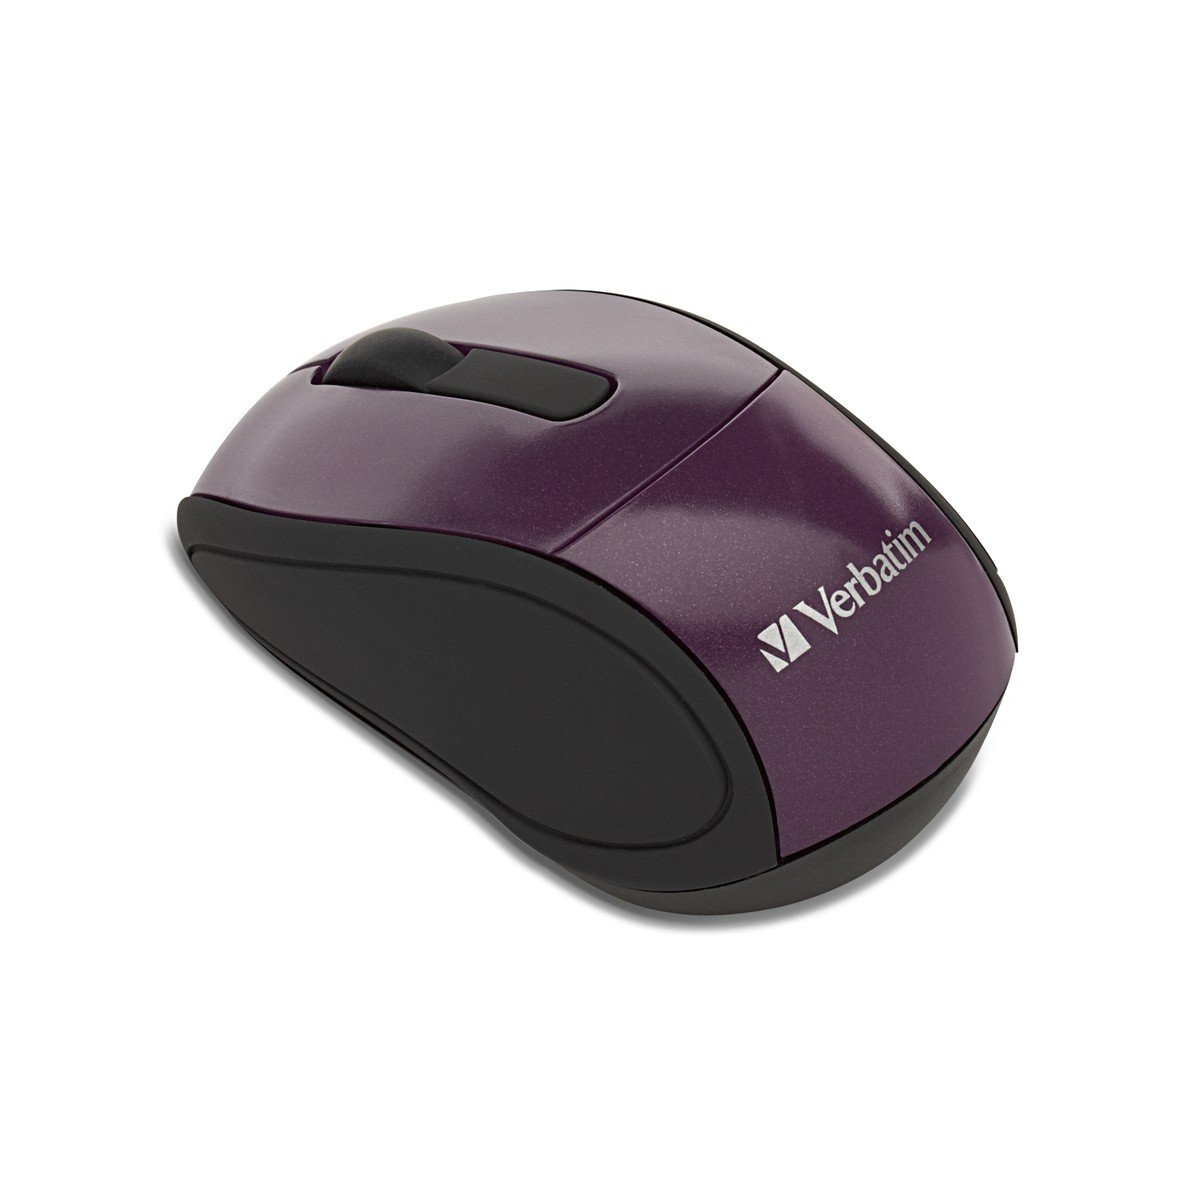 Amazon.com  Verbatim Wireless Mini Travel Optical Mouse - Purple   Electronics a87f93b14b